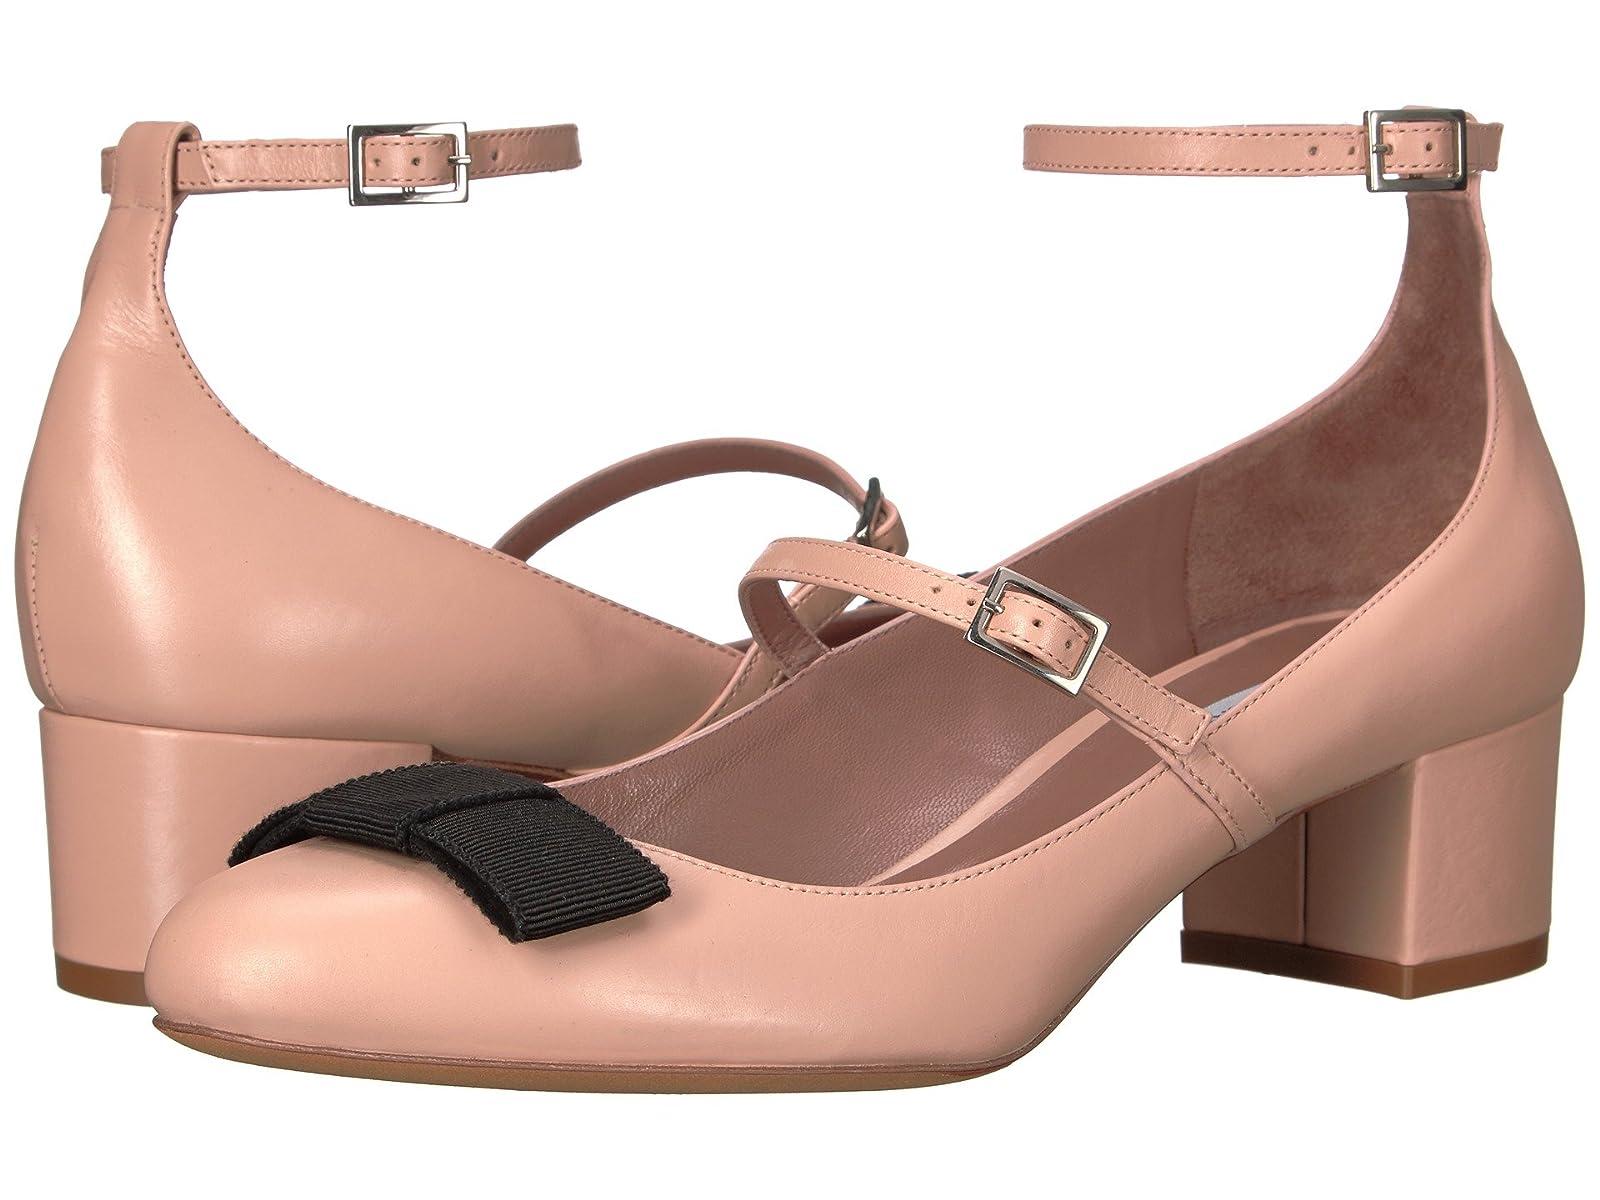 Tabitha Simmons RubiaCheap and distinctive eye-catching shoes